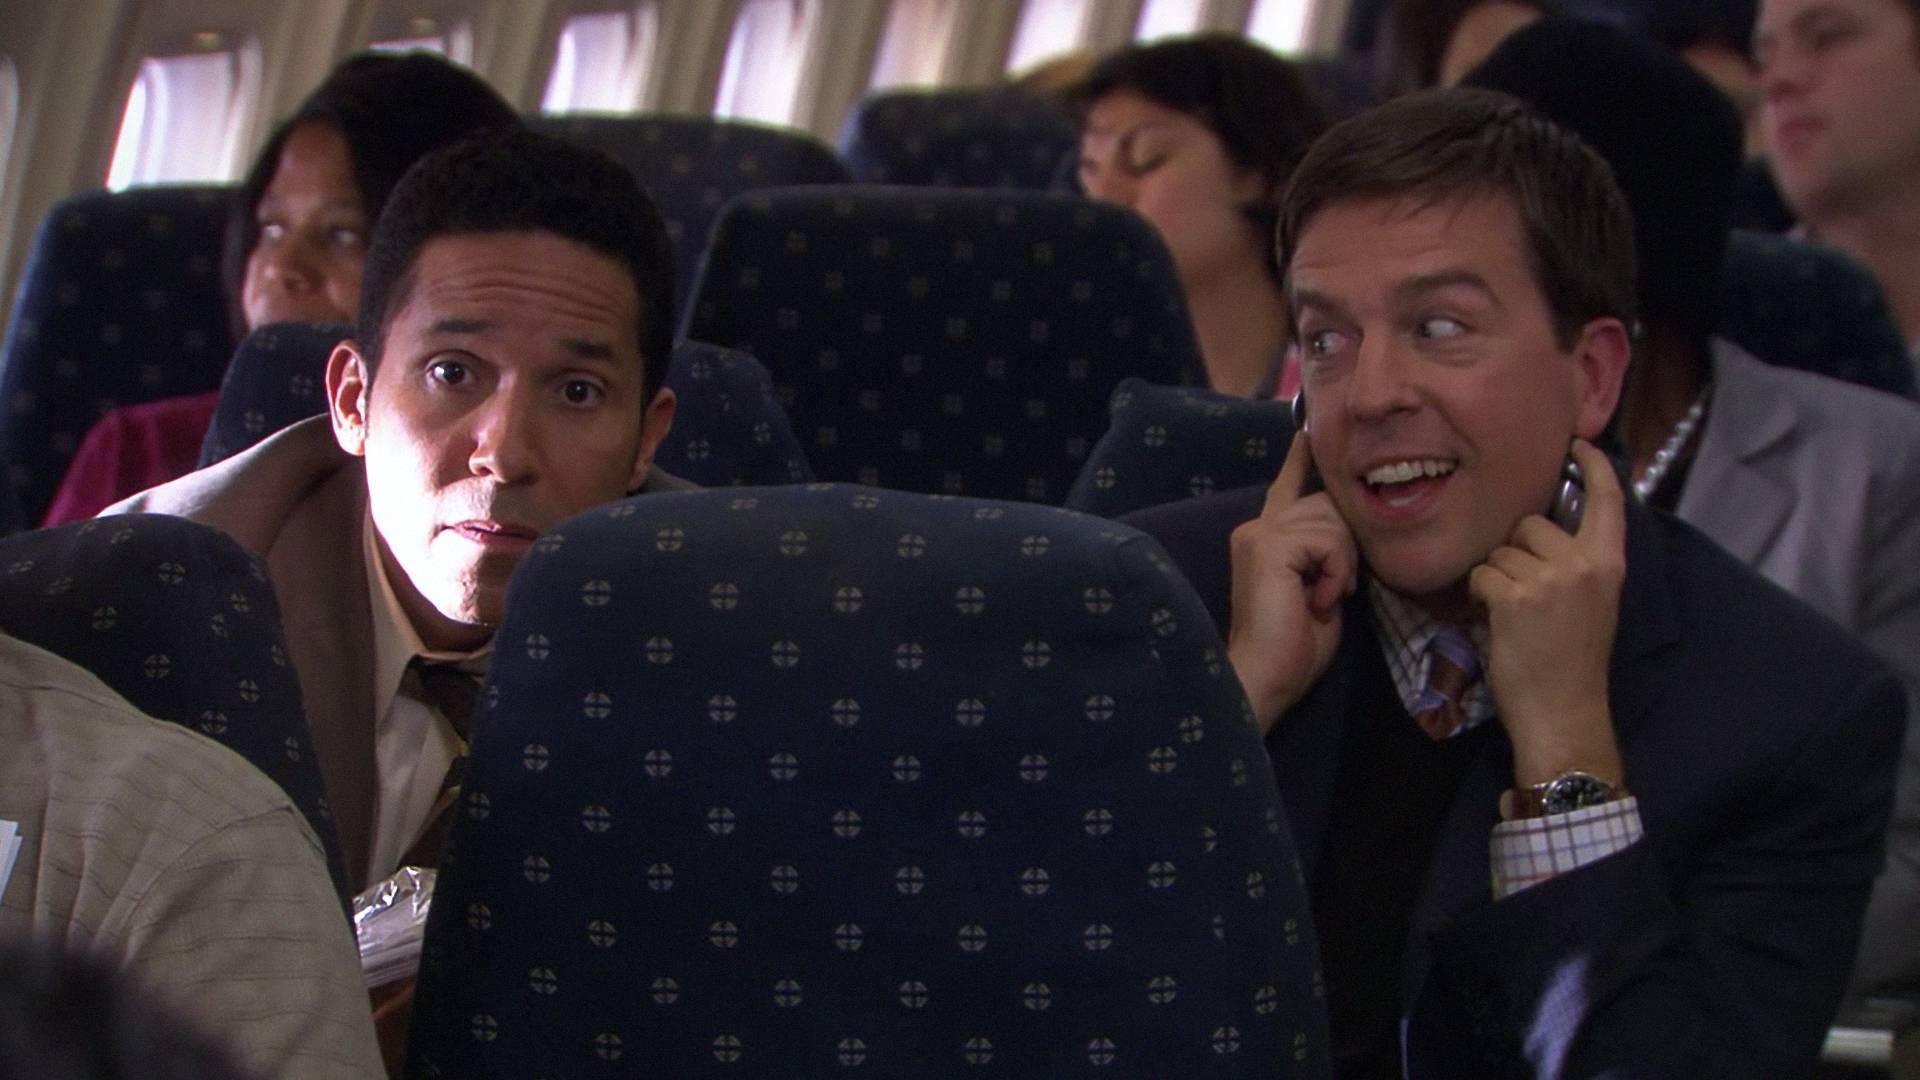 The Office Season 5 Episode 8